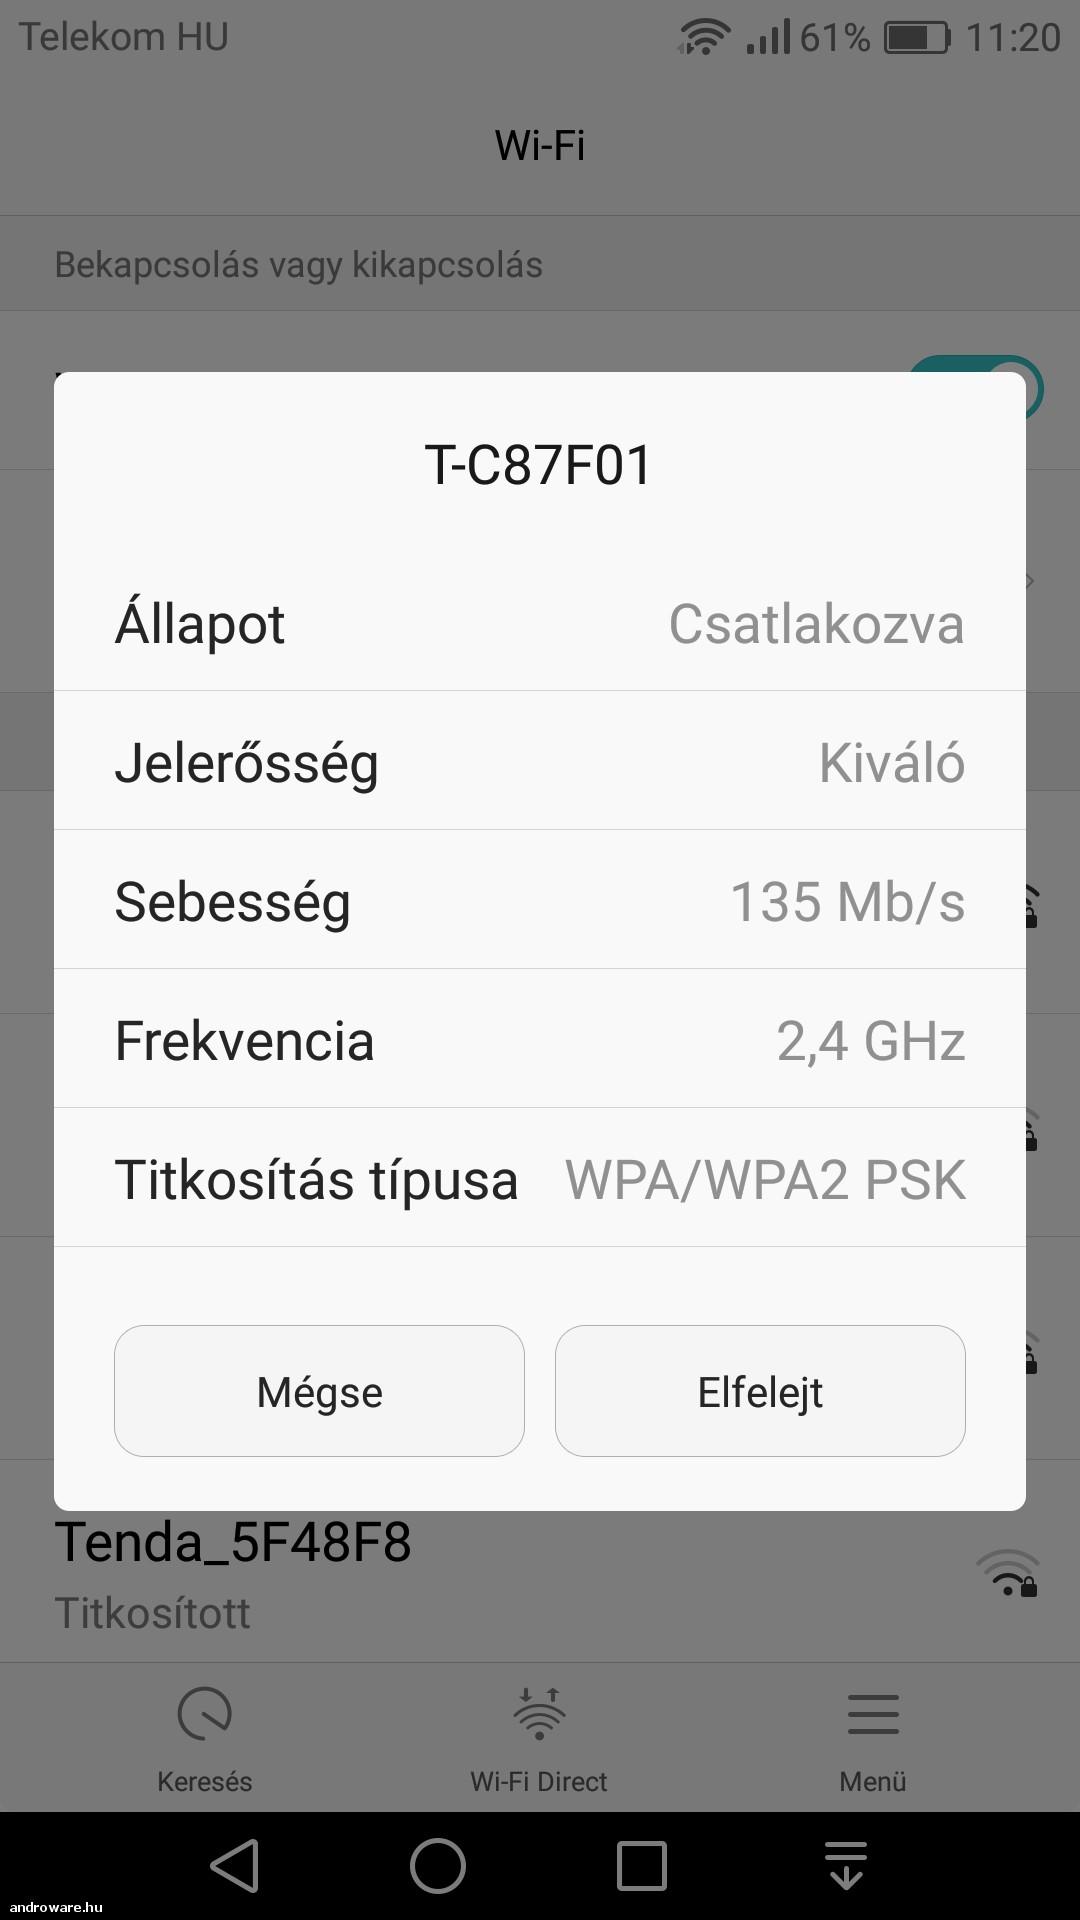 Screenshot_2016-12-31-11-20-58.png